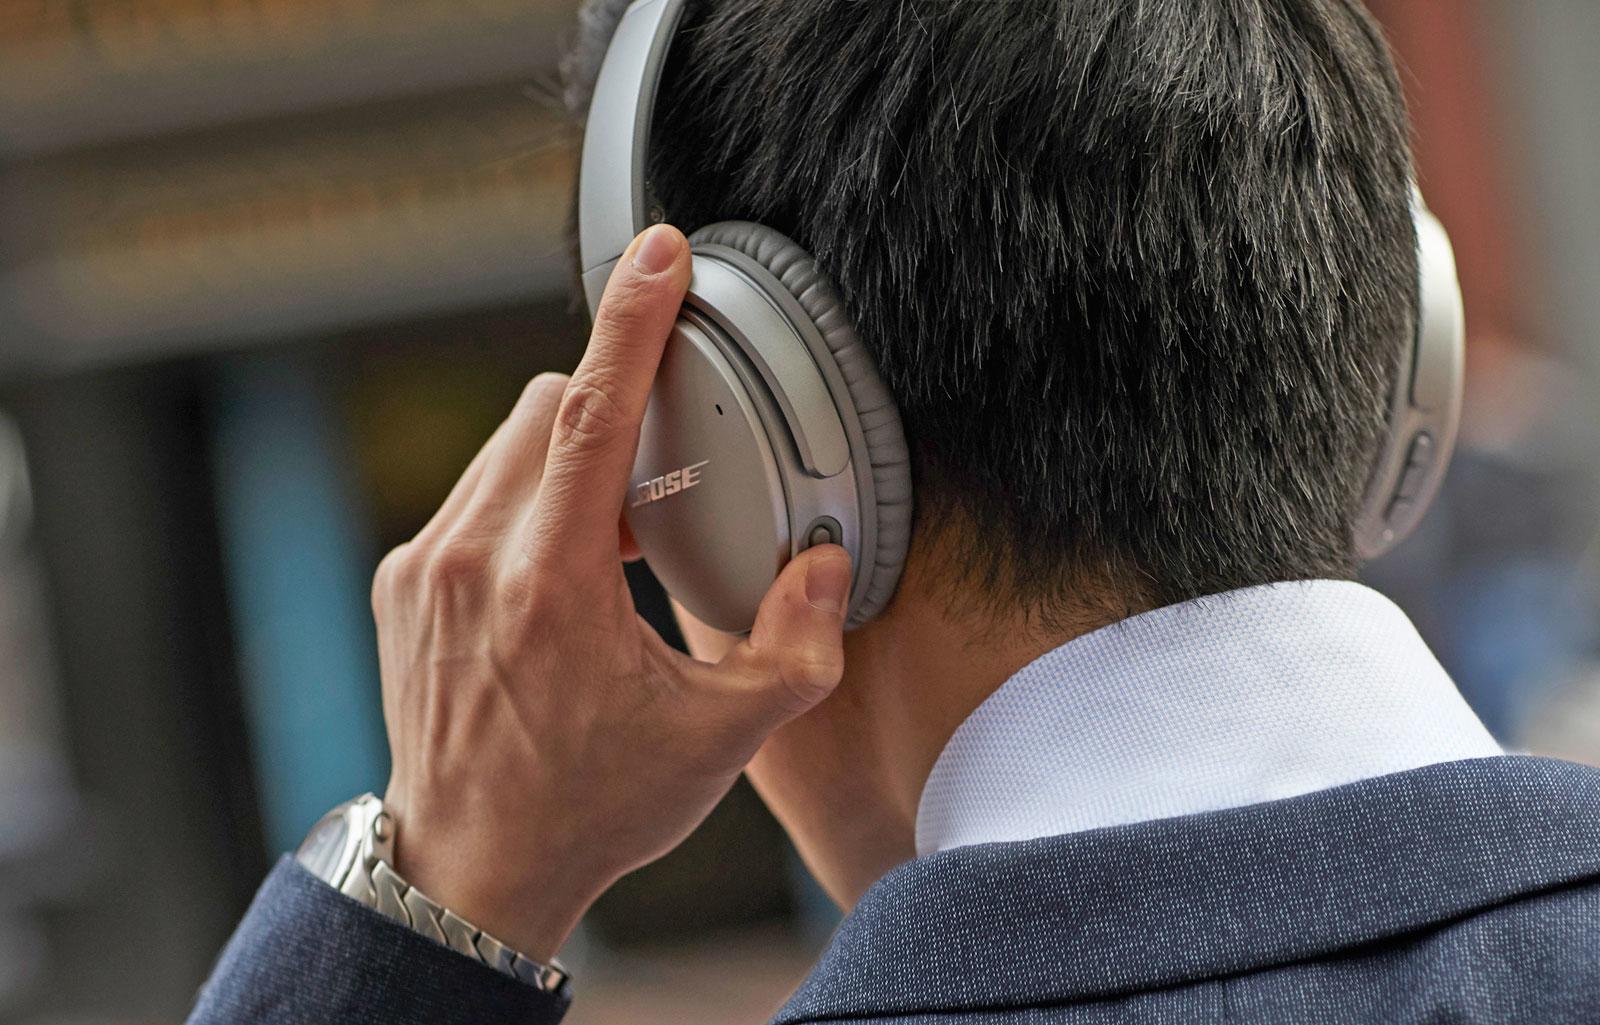 BOSE、Googleアシスタントを搭載した初のヘッドフォン「QuietComfort 35 II」発表、350ドル